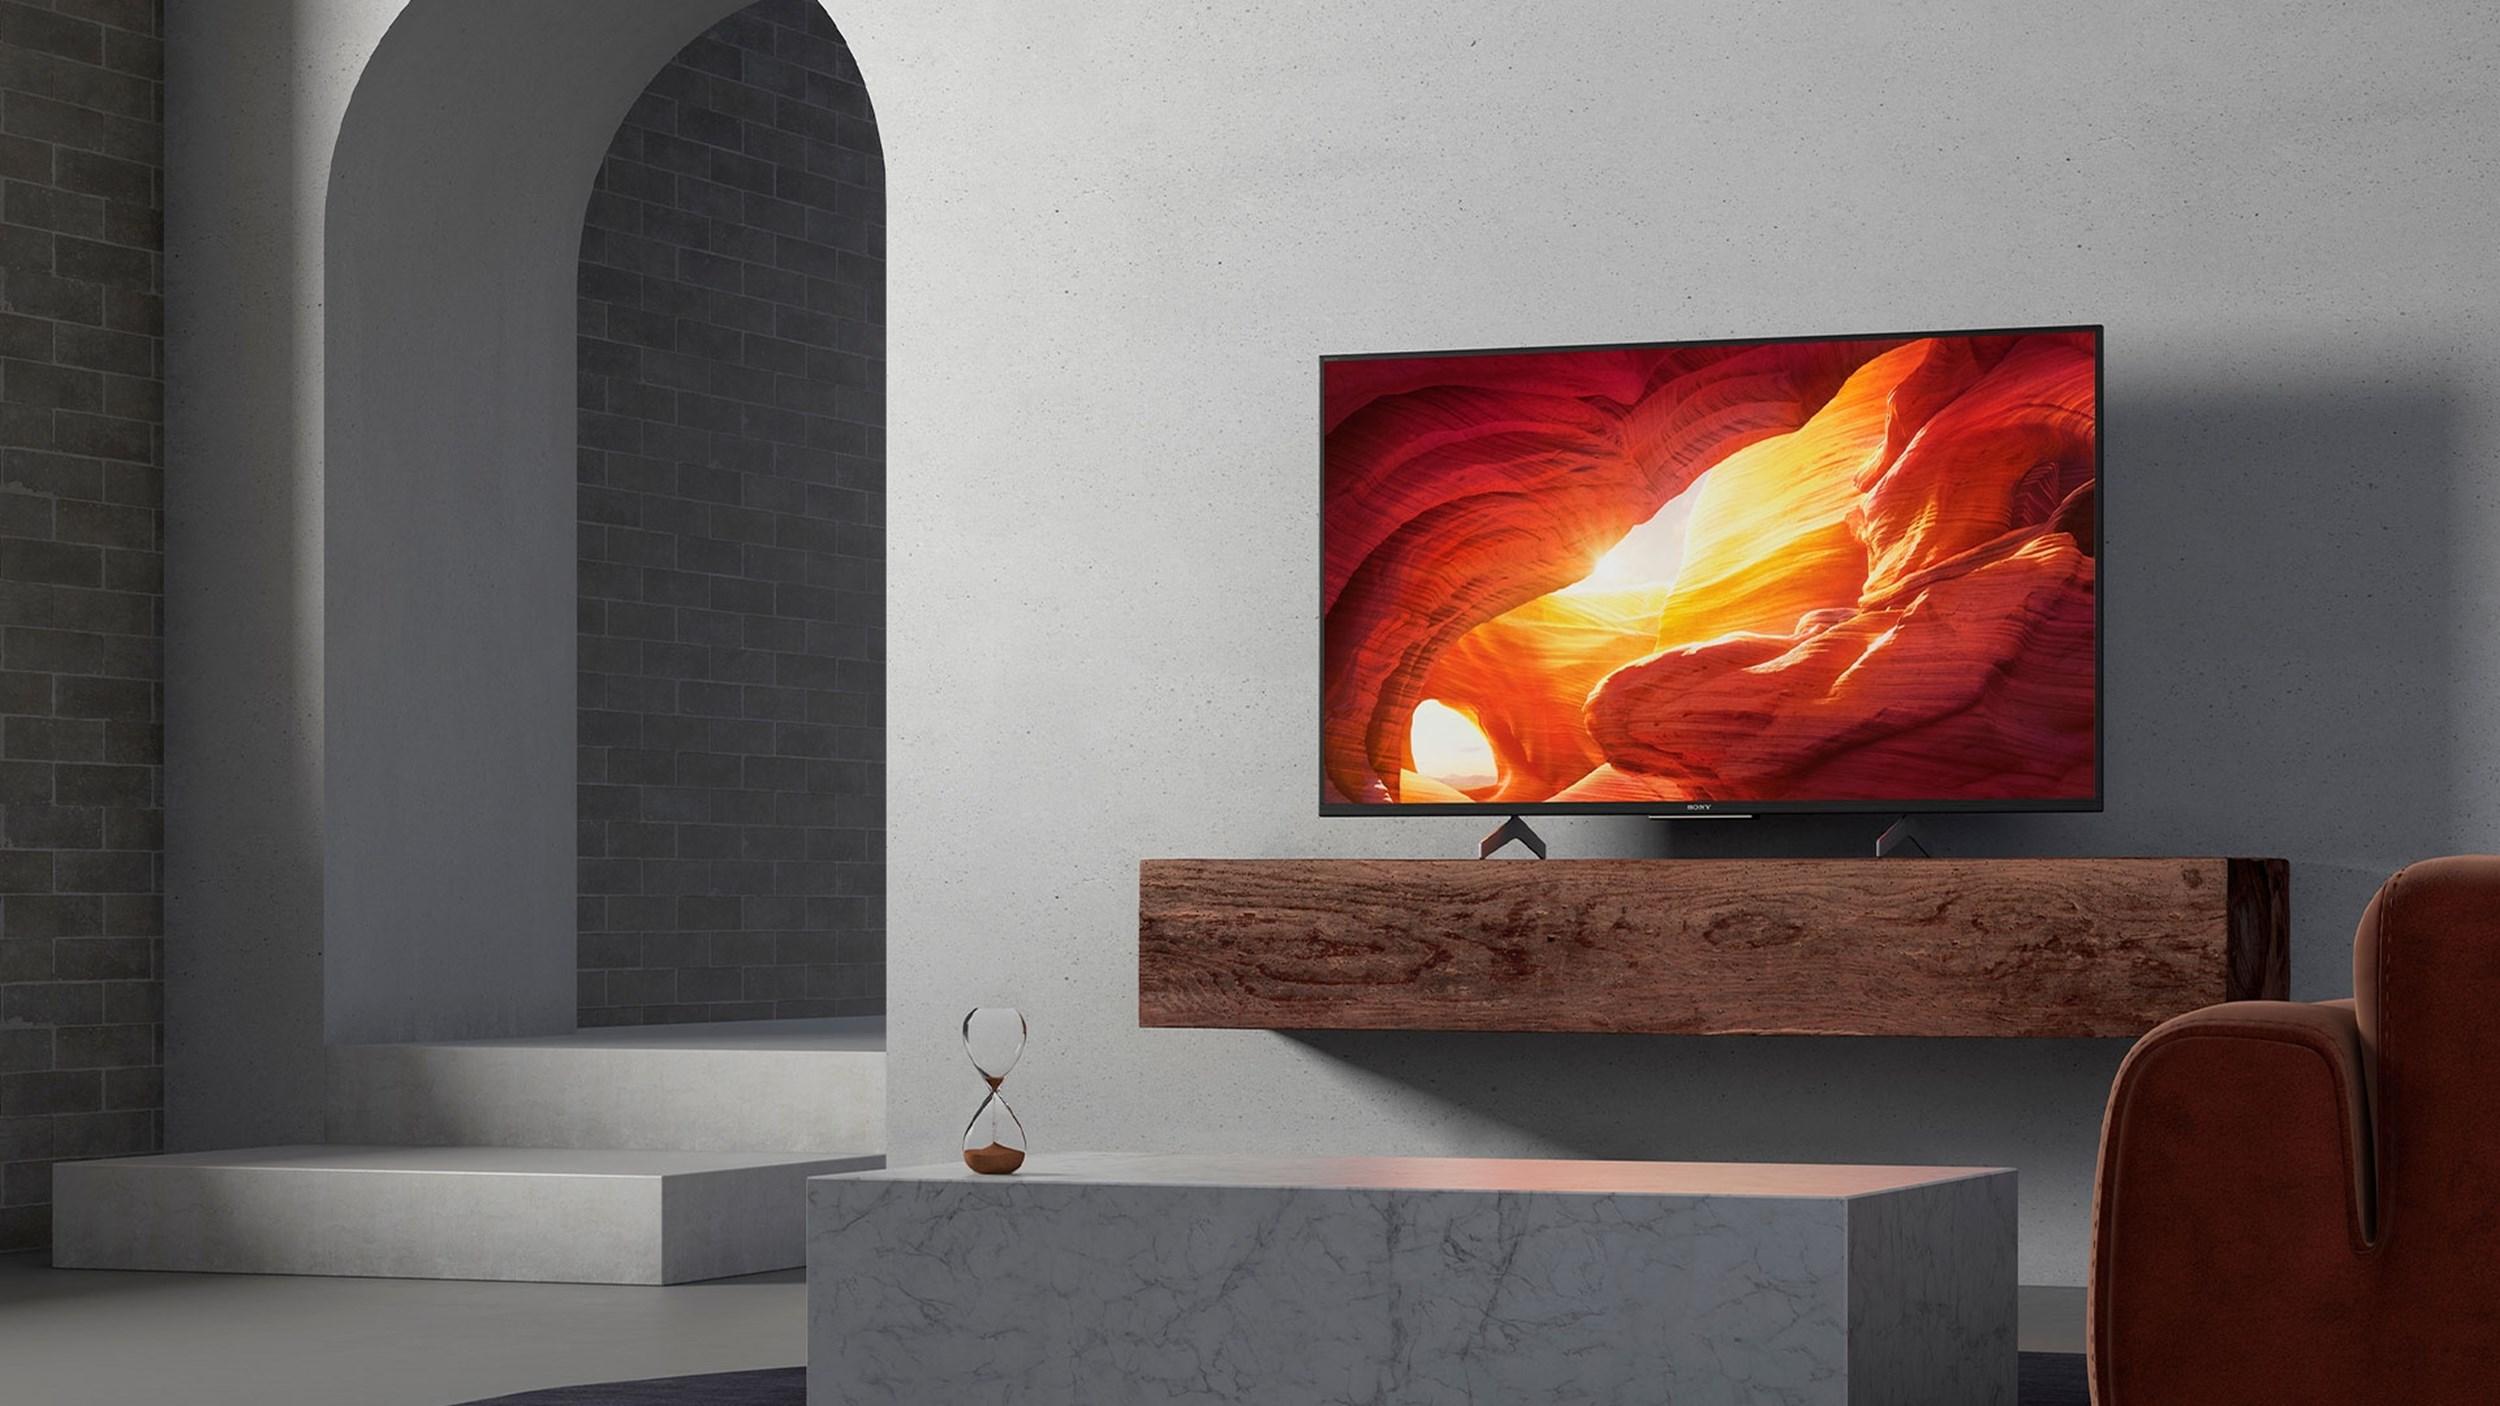 Sony KD43XH8505 UHD-TV